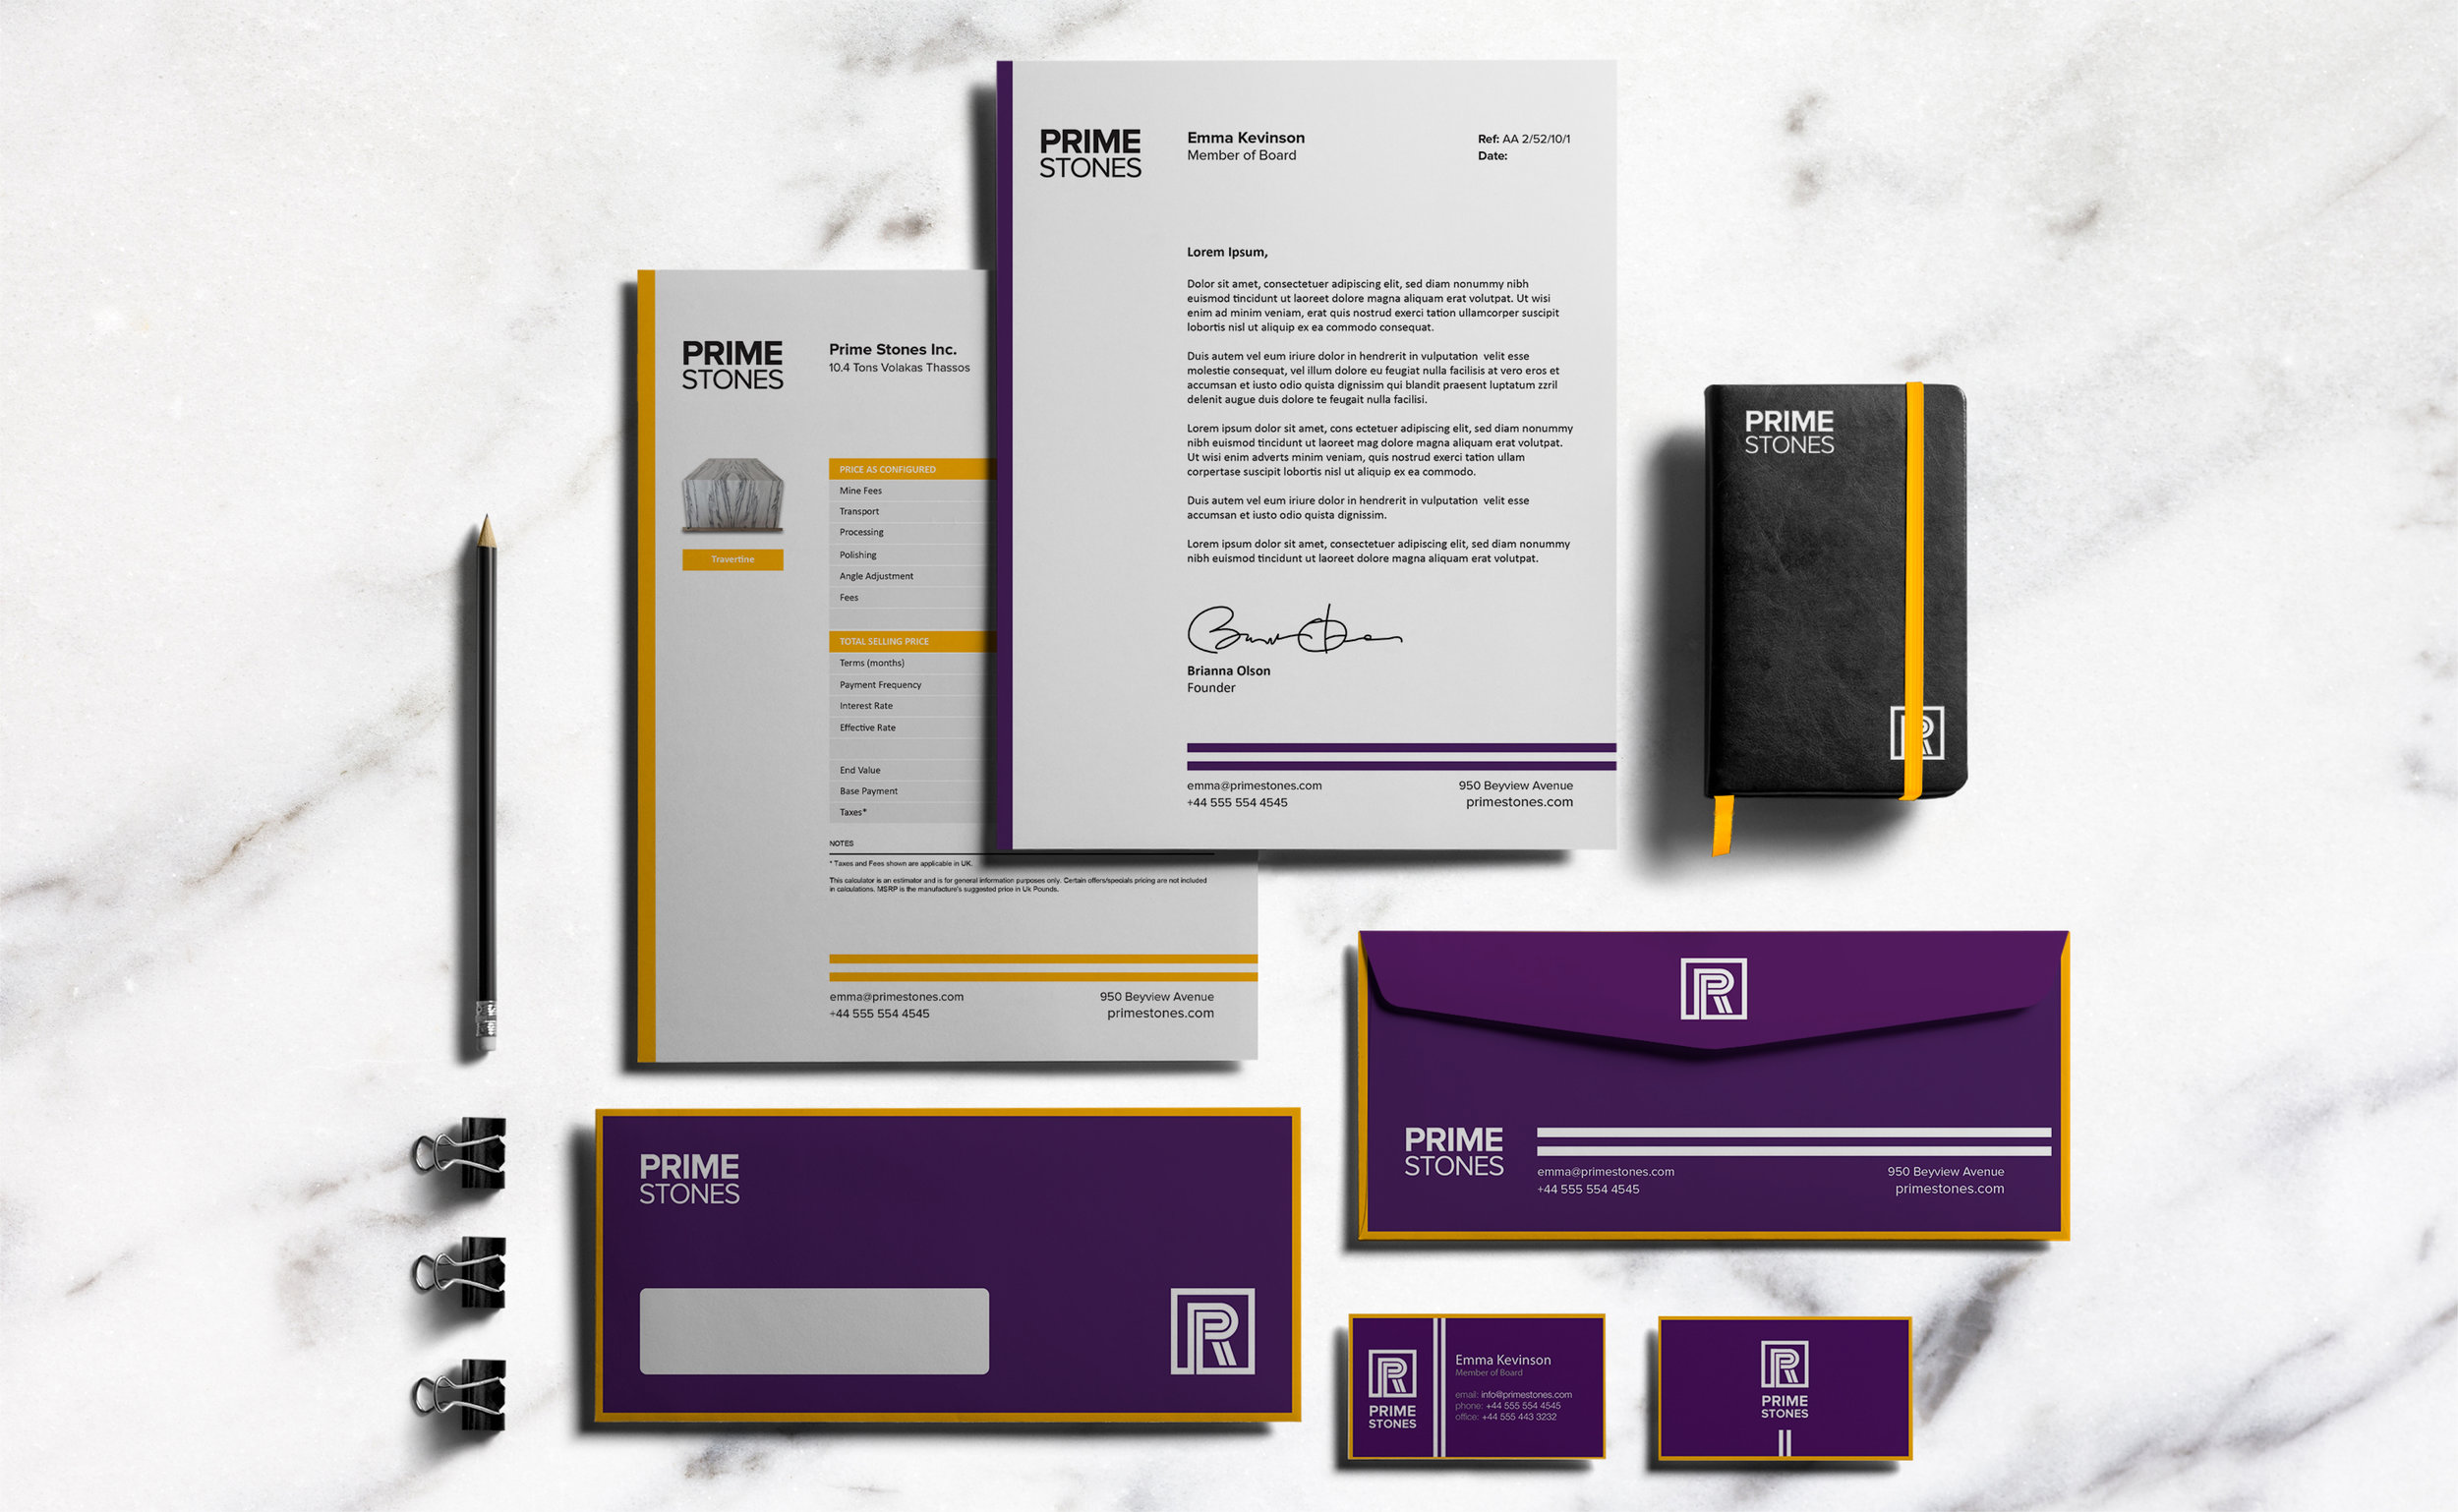 Prime Stones re-branding – Stationary Design two